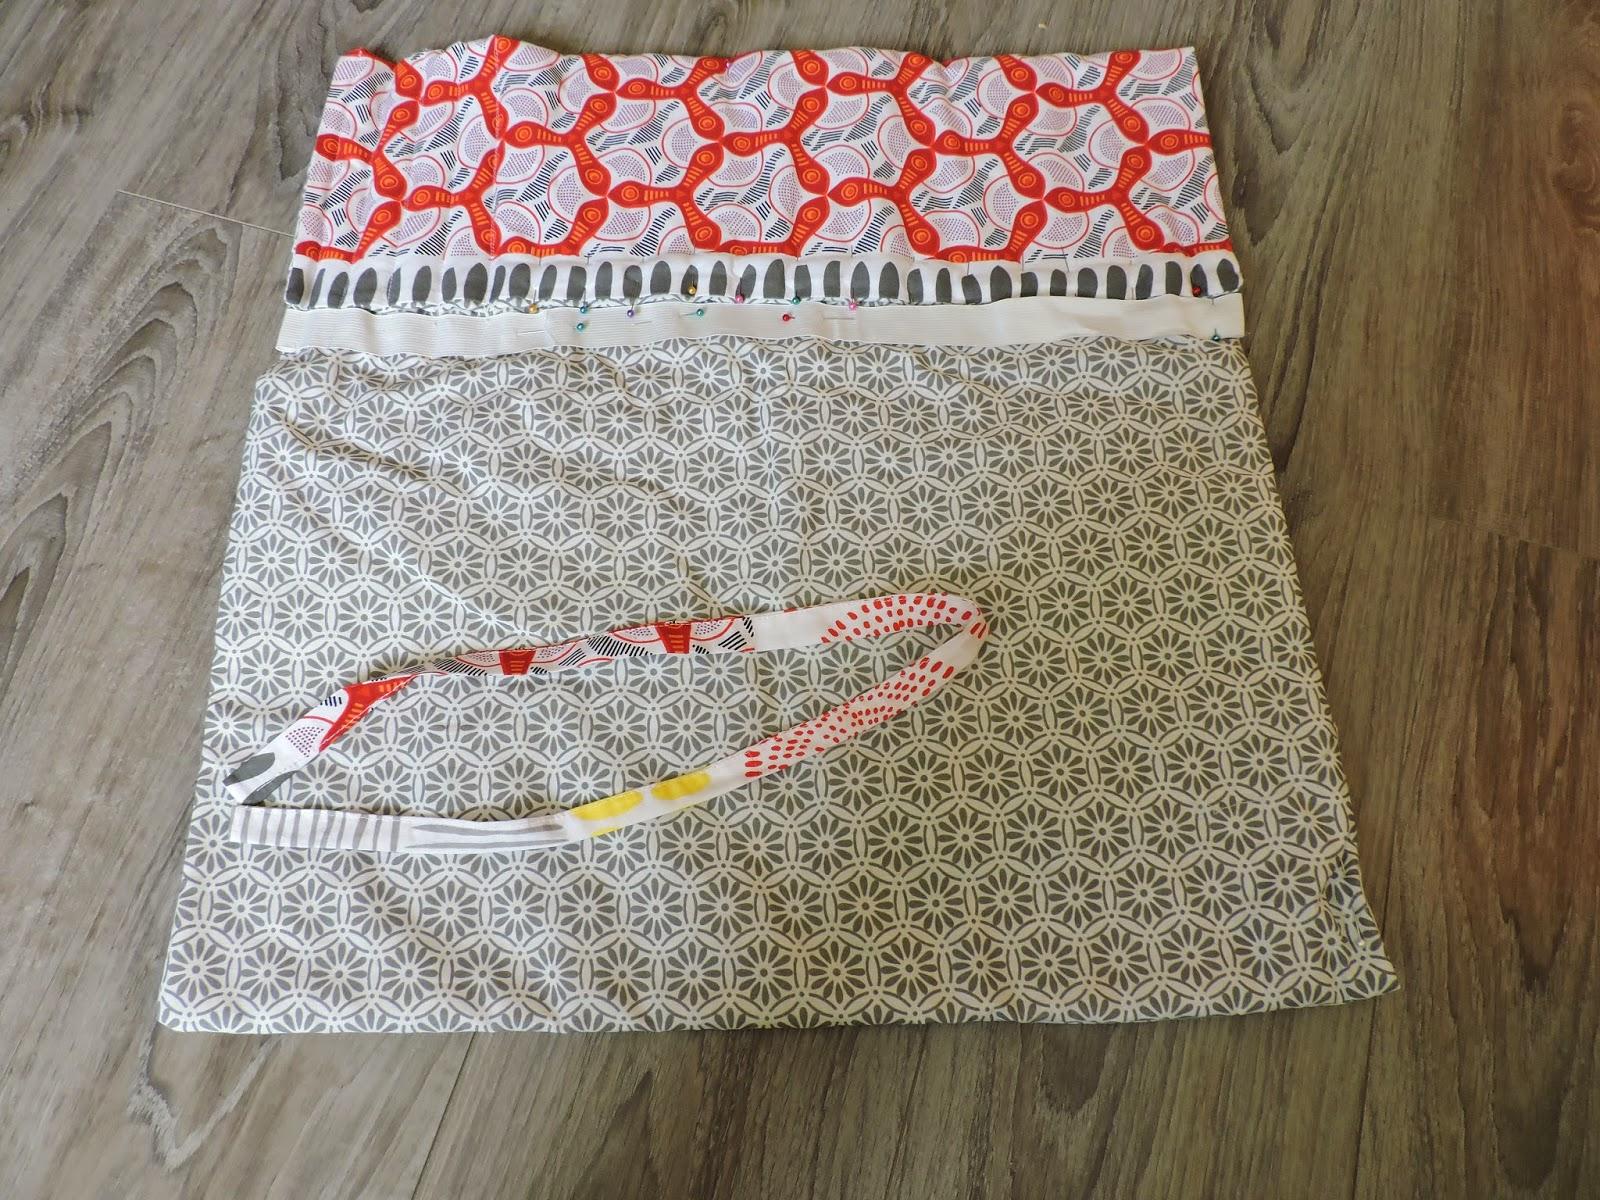 F e main couture range aiguilles tricoter for Aiguille a couture